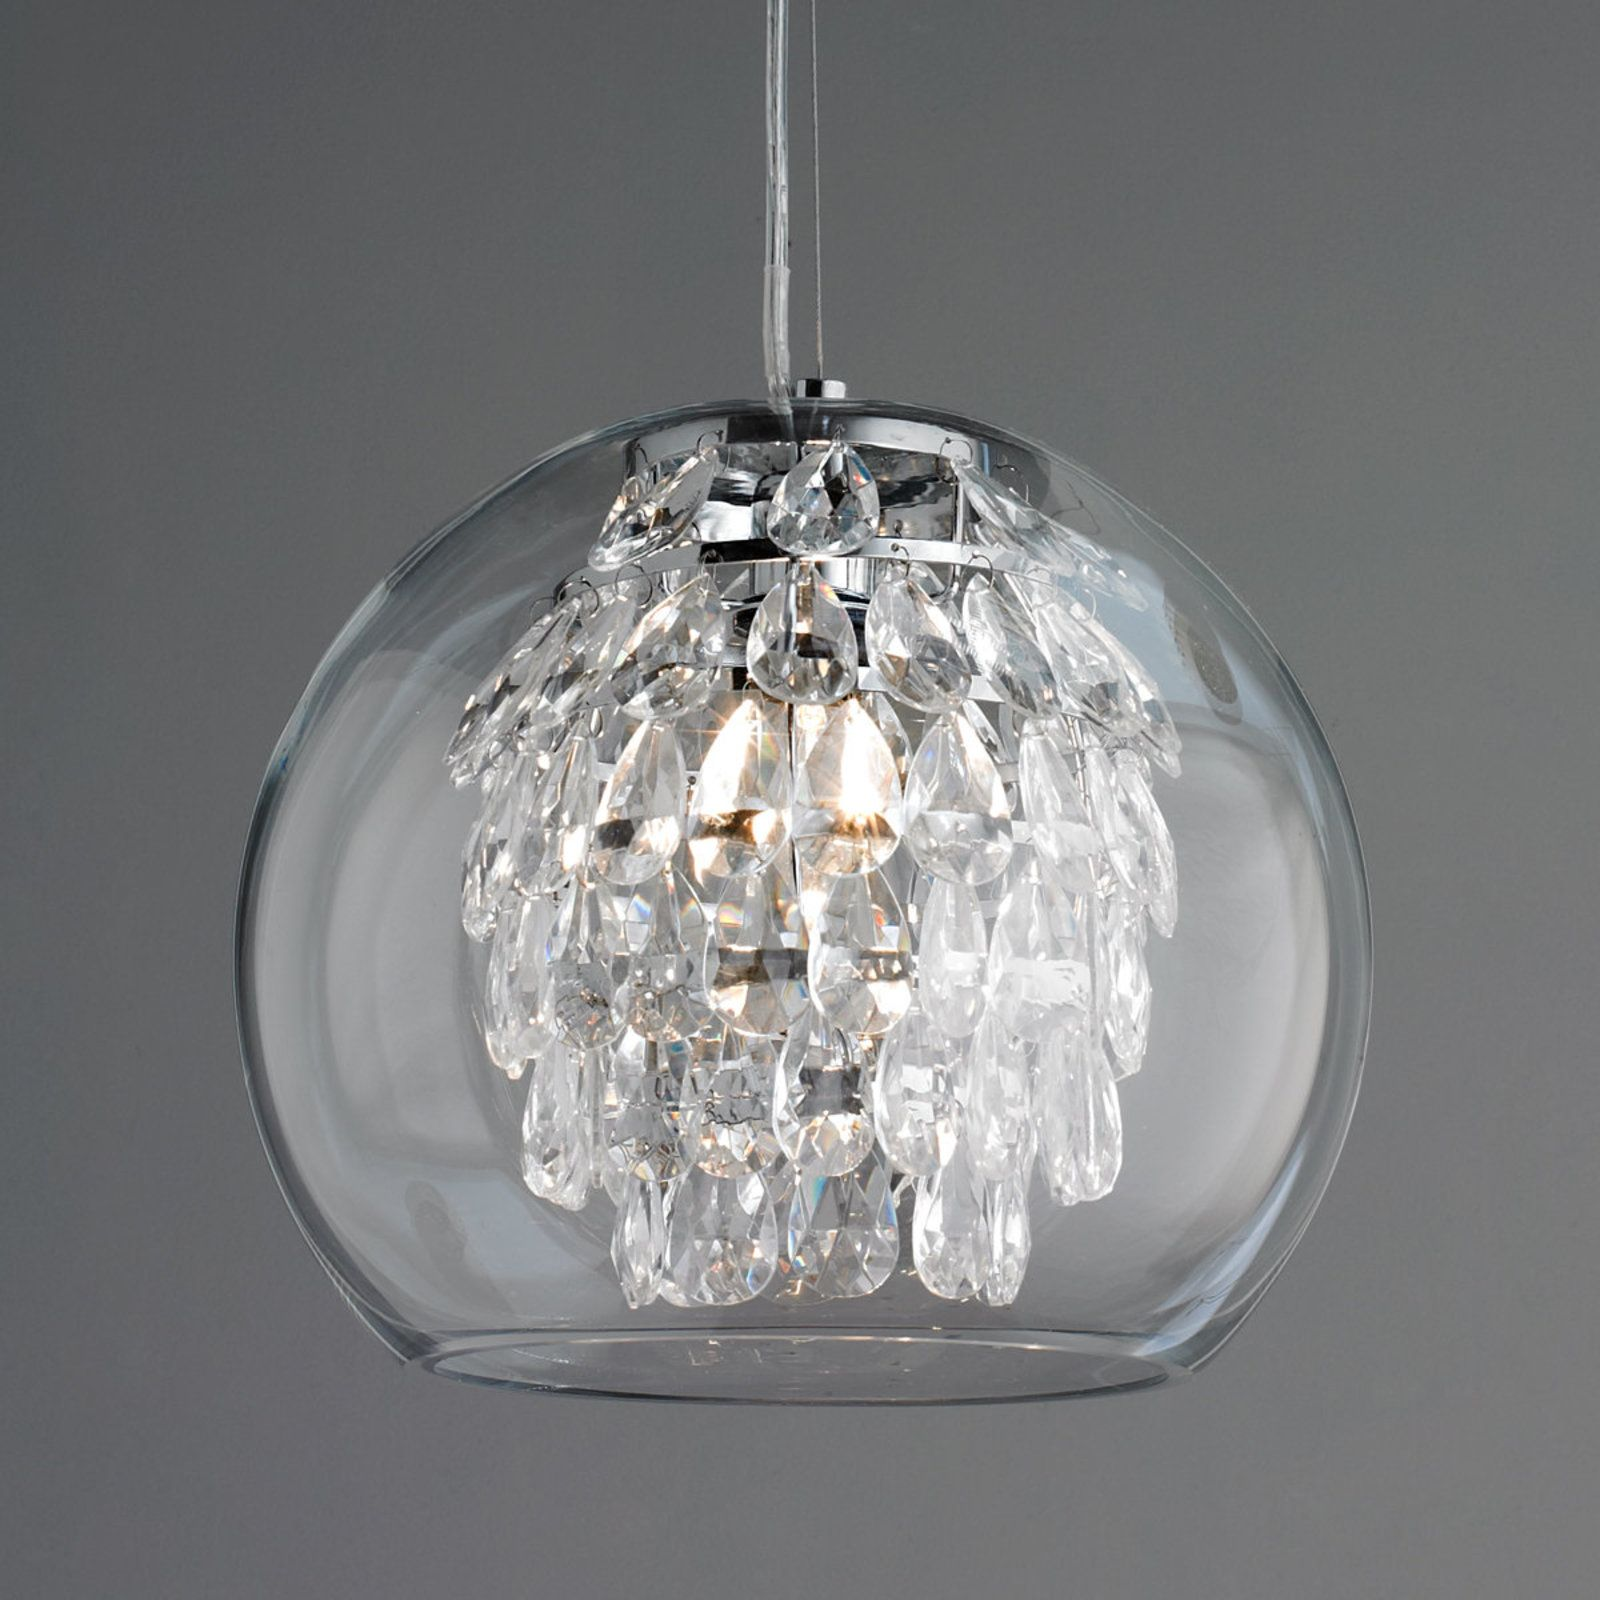 glass globe and crystal pendant light in 2019 ceilings crystal rh pinterest com